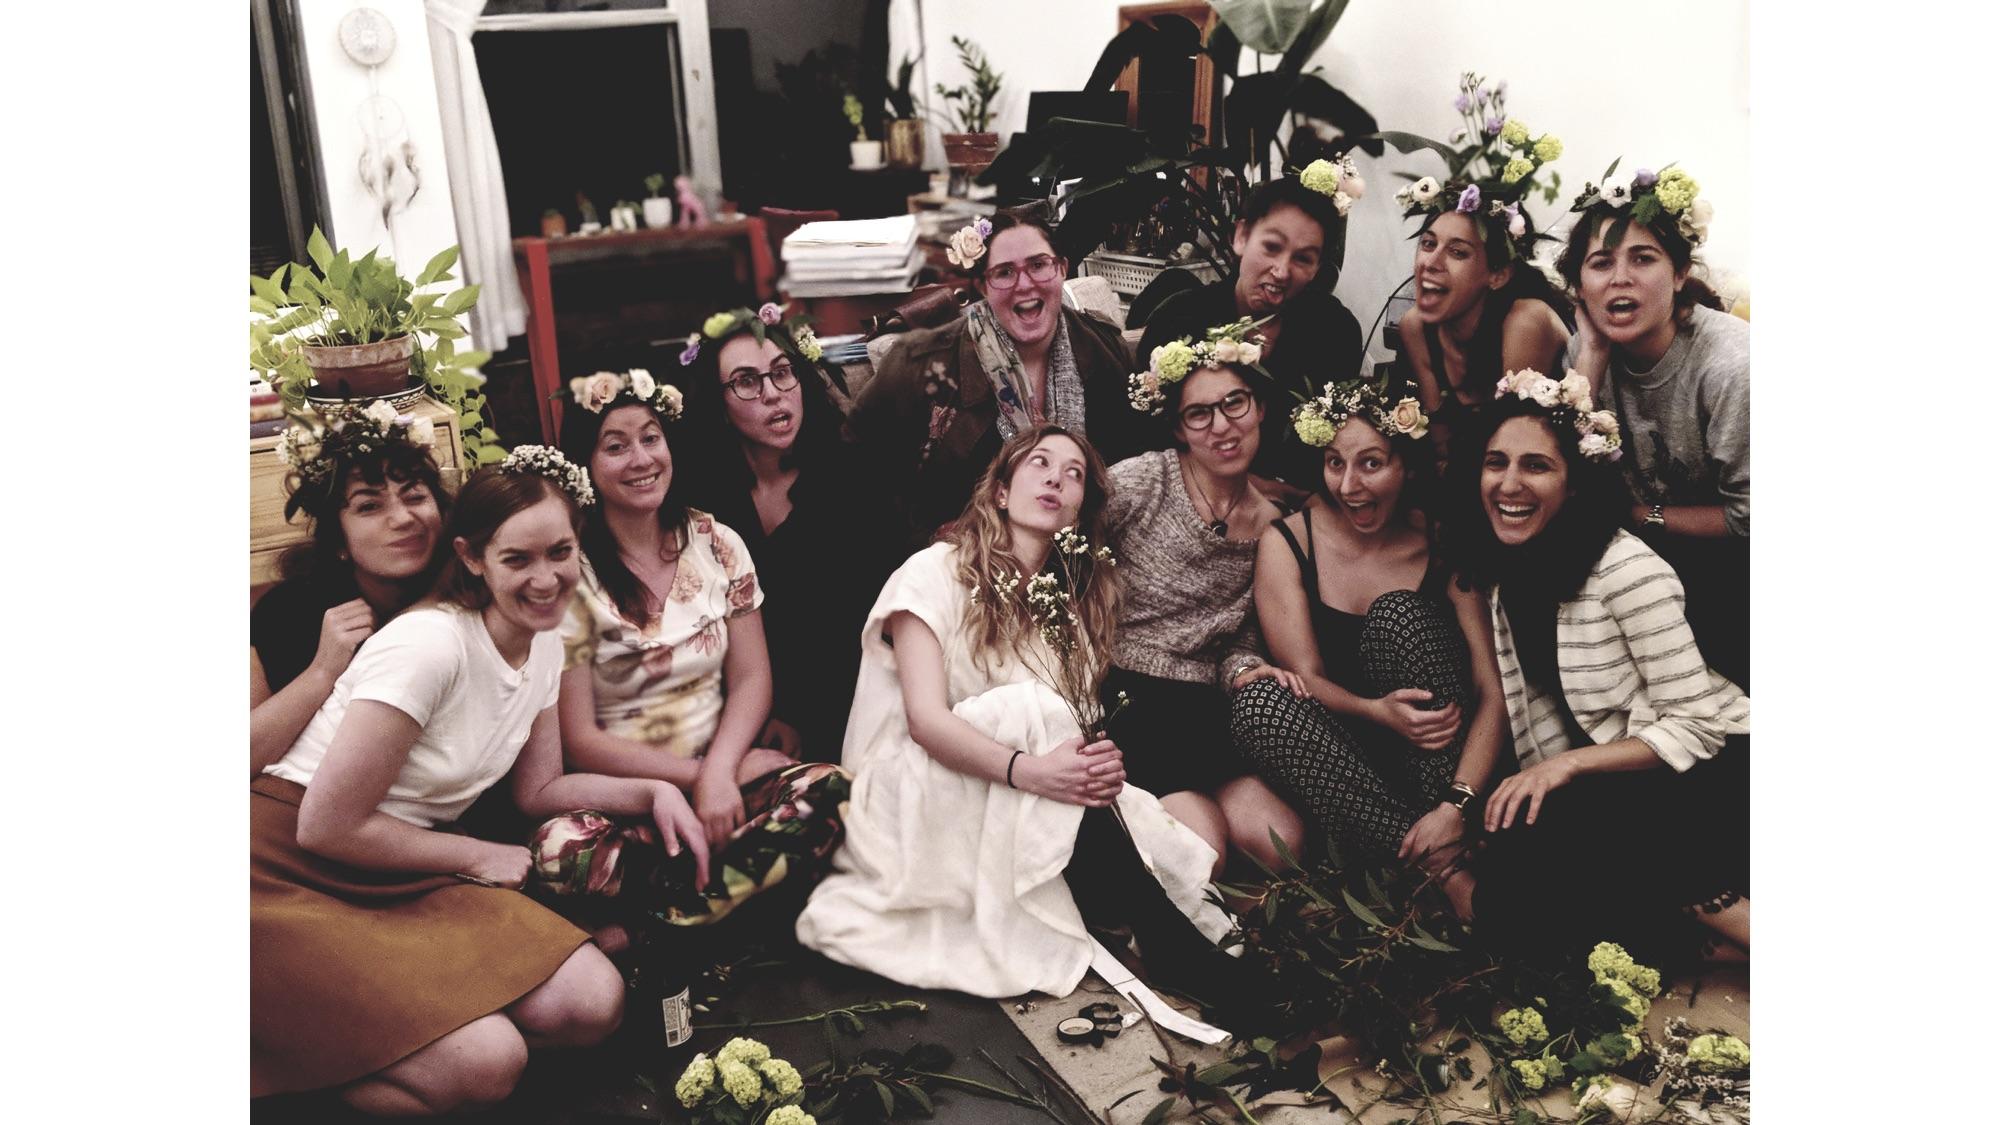 Flower Crown Time | Photo credit:  Danielle Friedman